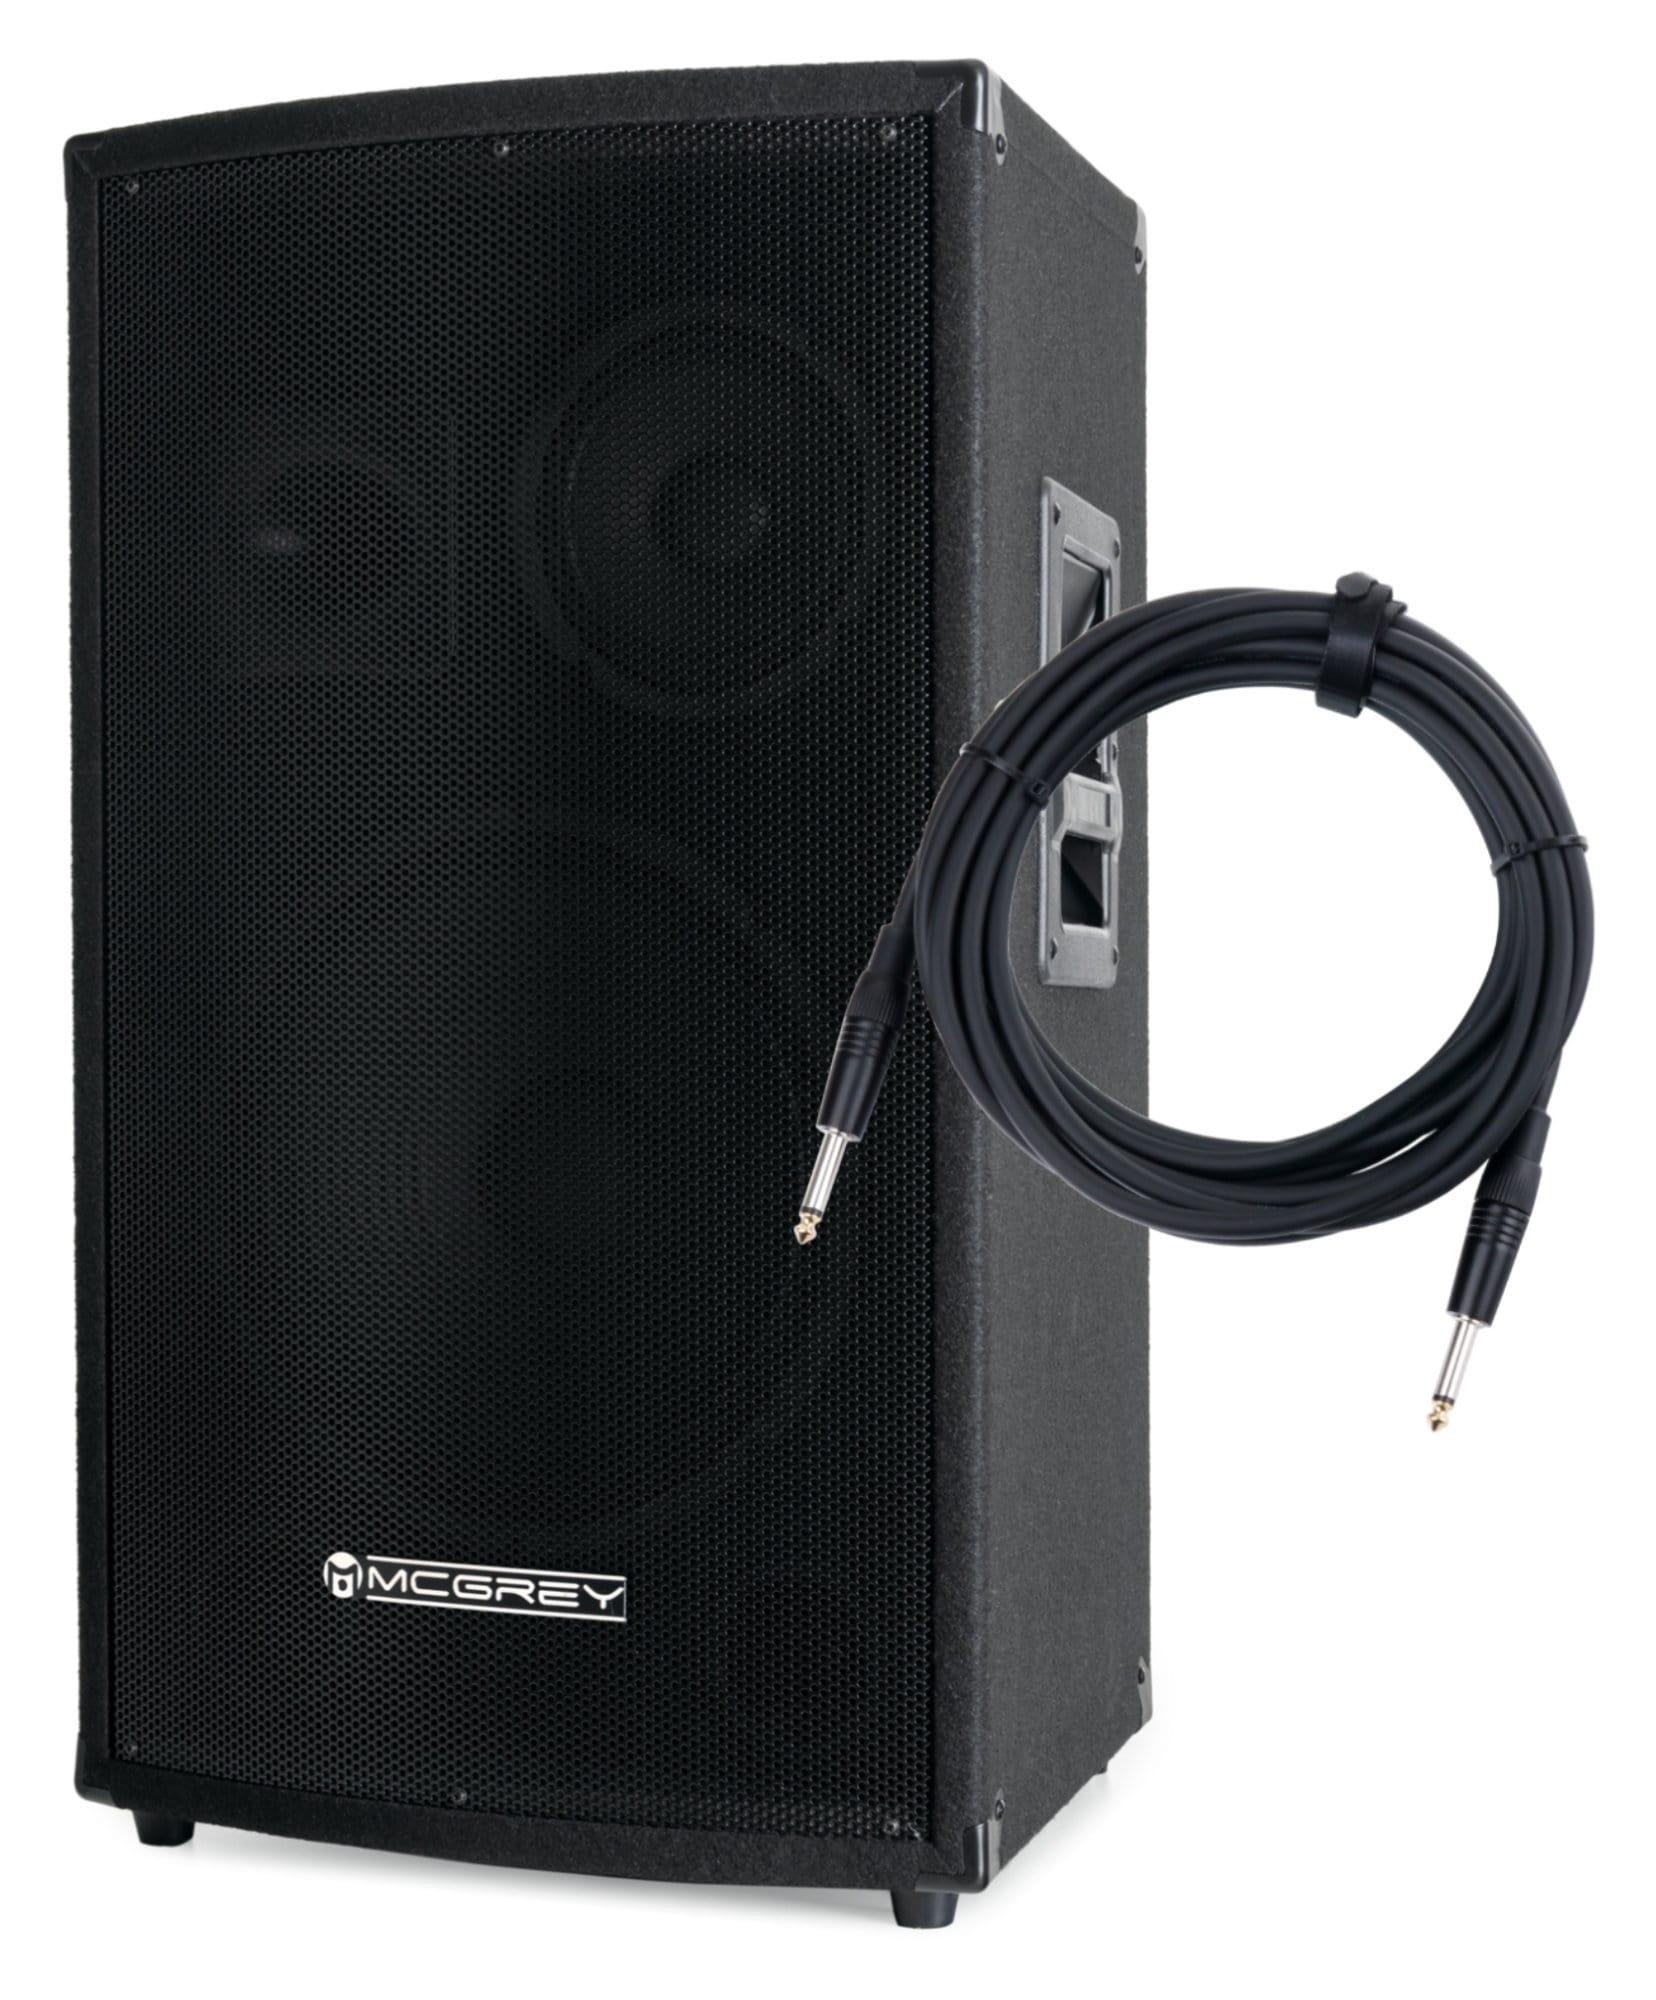 Paboxen - McGrey SL 12|3 12' 3 Wege Passivbox Set inkl. Kabel - Onlineshop Musikhaus Kirstein